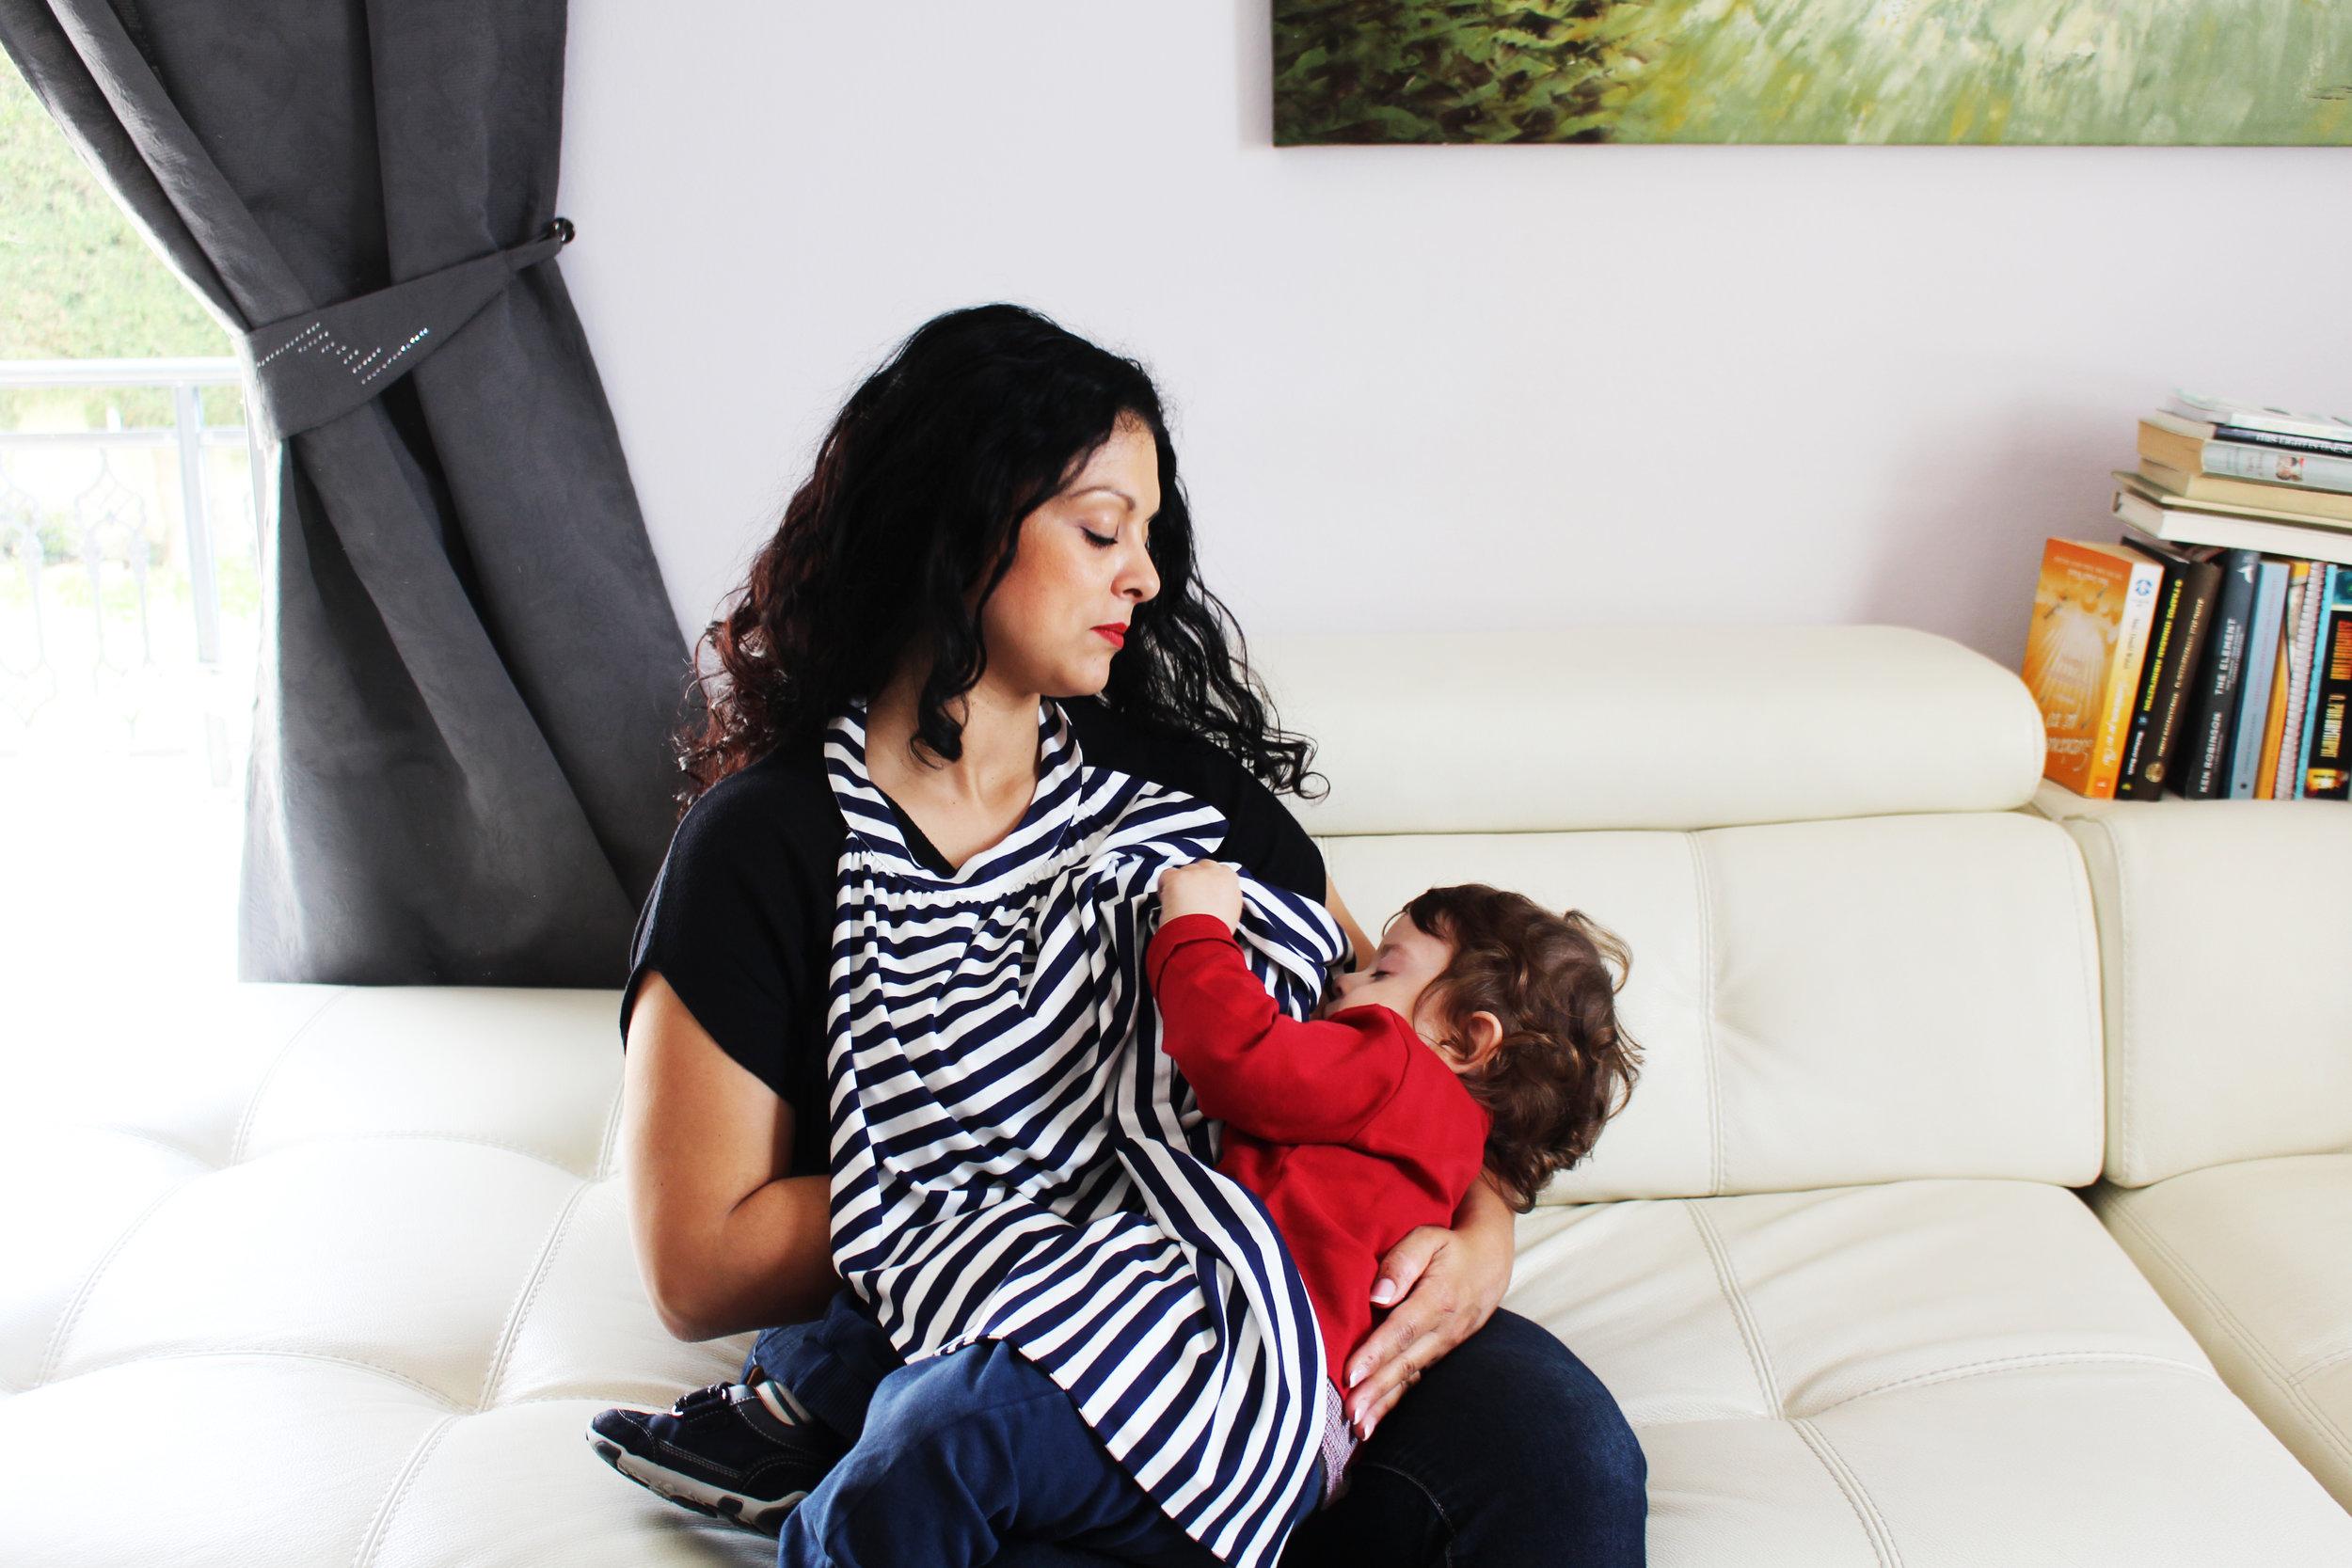 MamaBib Breastfeeding Cover